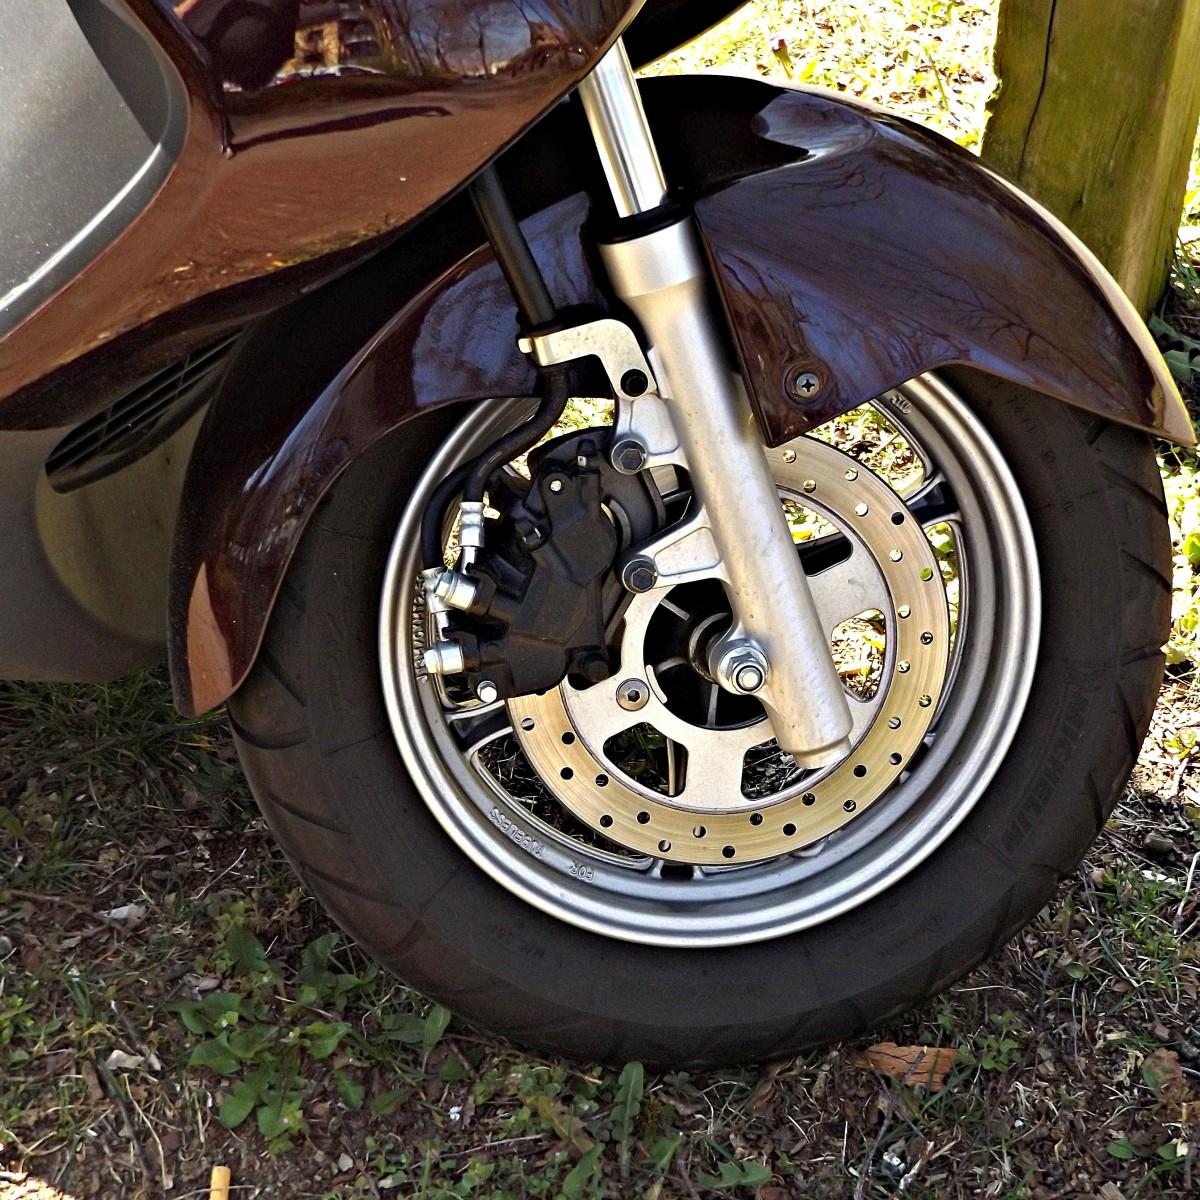 images gratuites voiture roue v hicule parlait frein pneu roues jante harley davidson. Black Bedroom Furniture Sets. Home Design Ideas